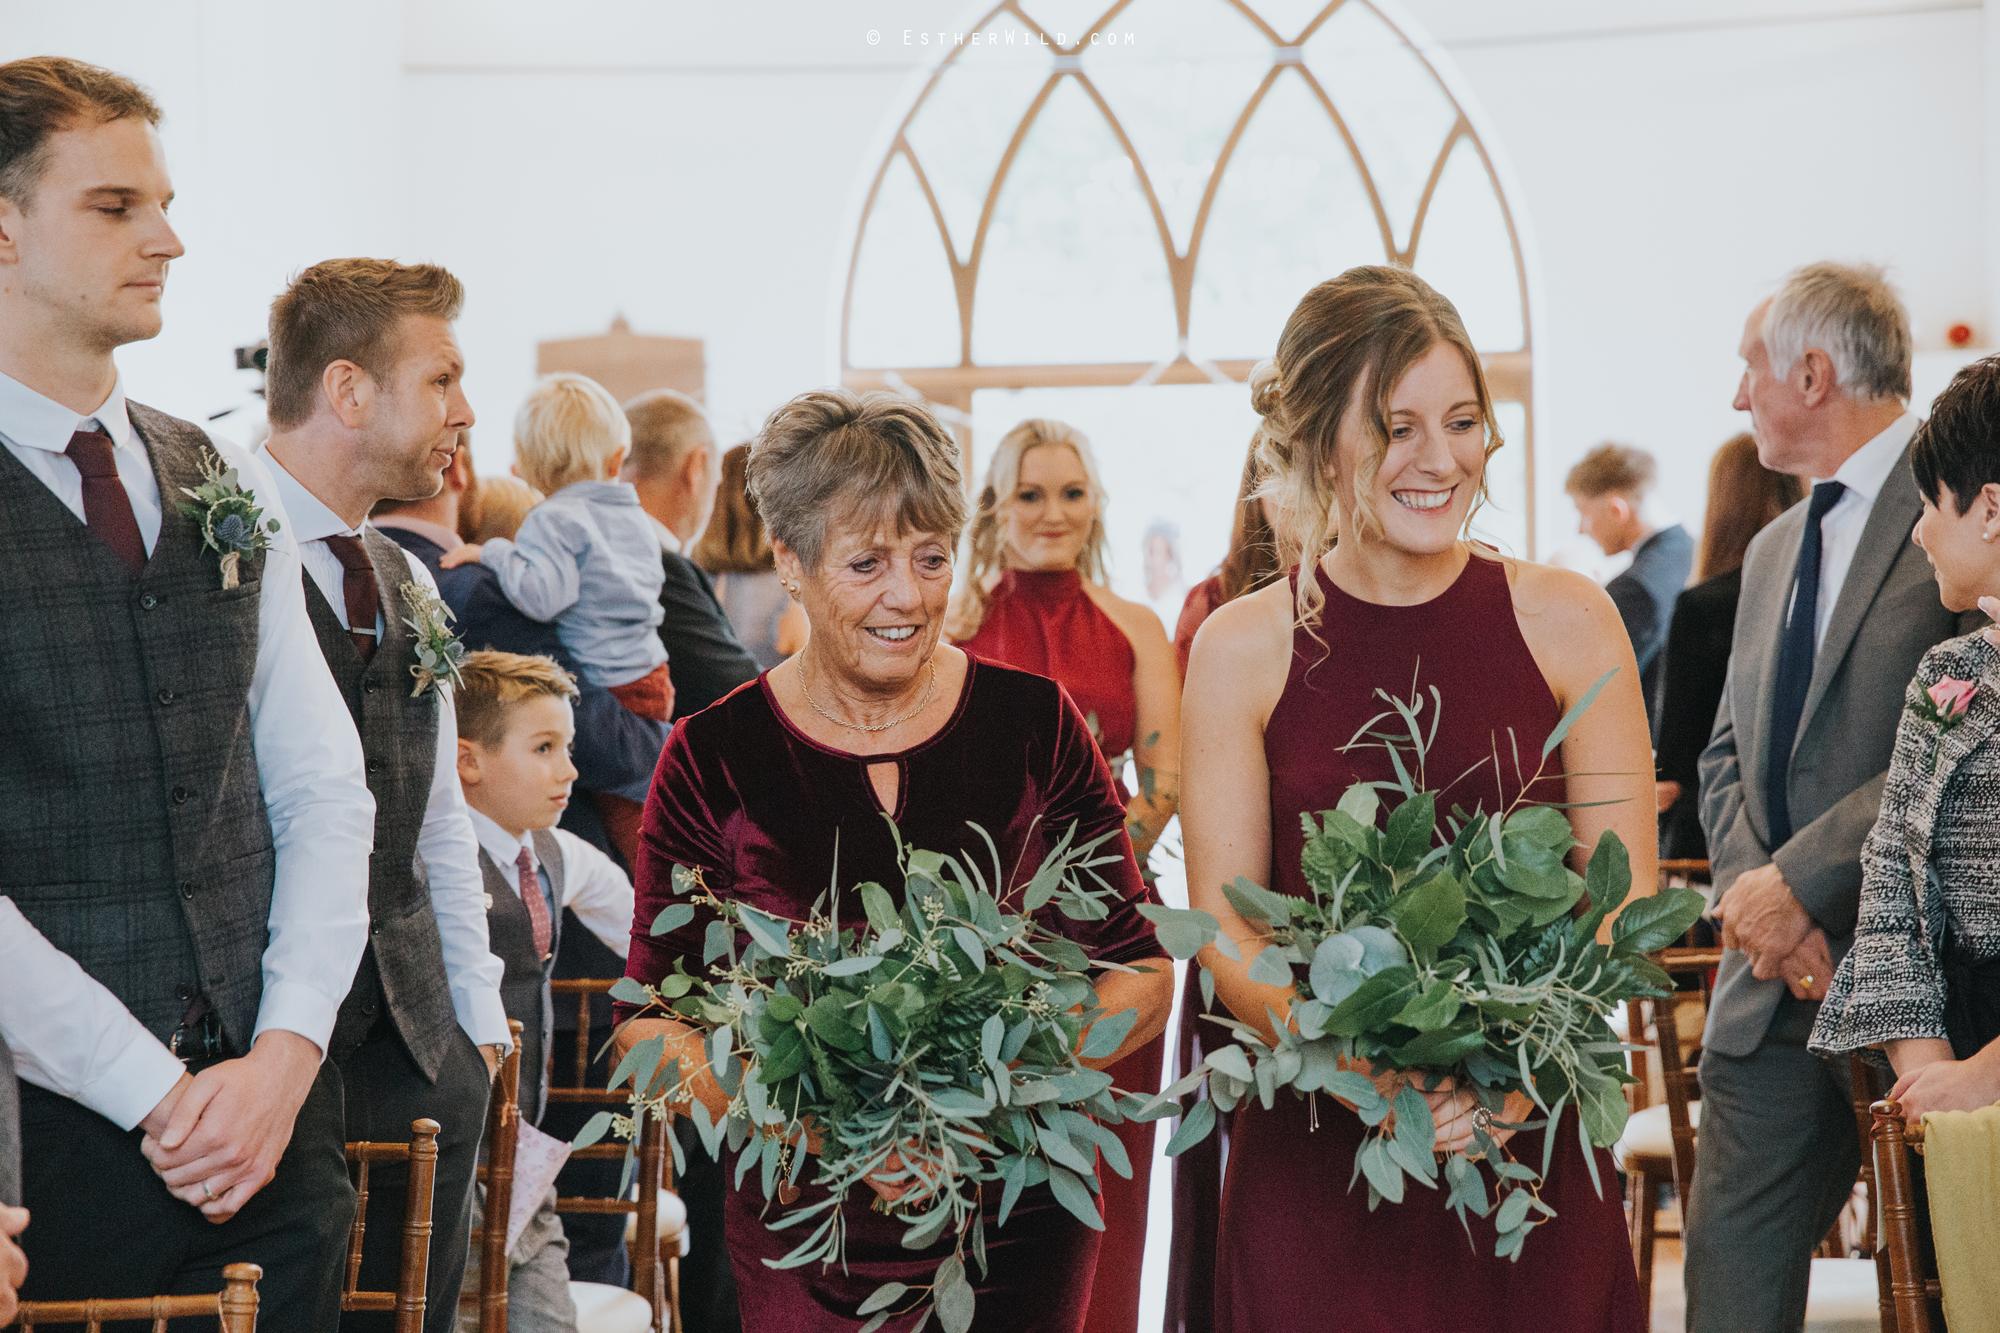 Reading_Room_Weddings_Alby_Norwich_Photographer_Esther_Wild_IMG_0824.jpg